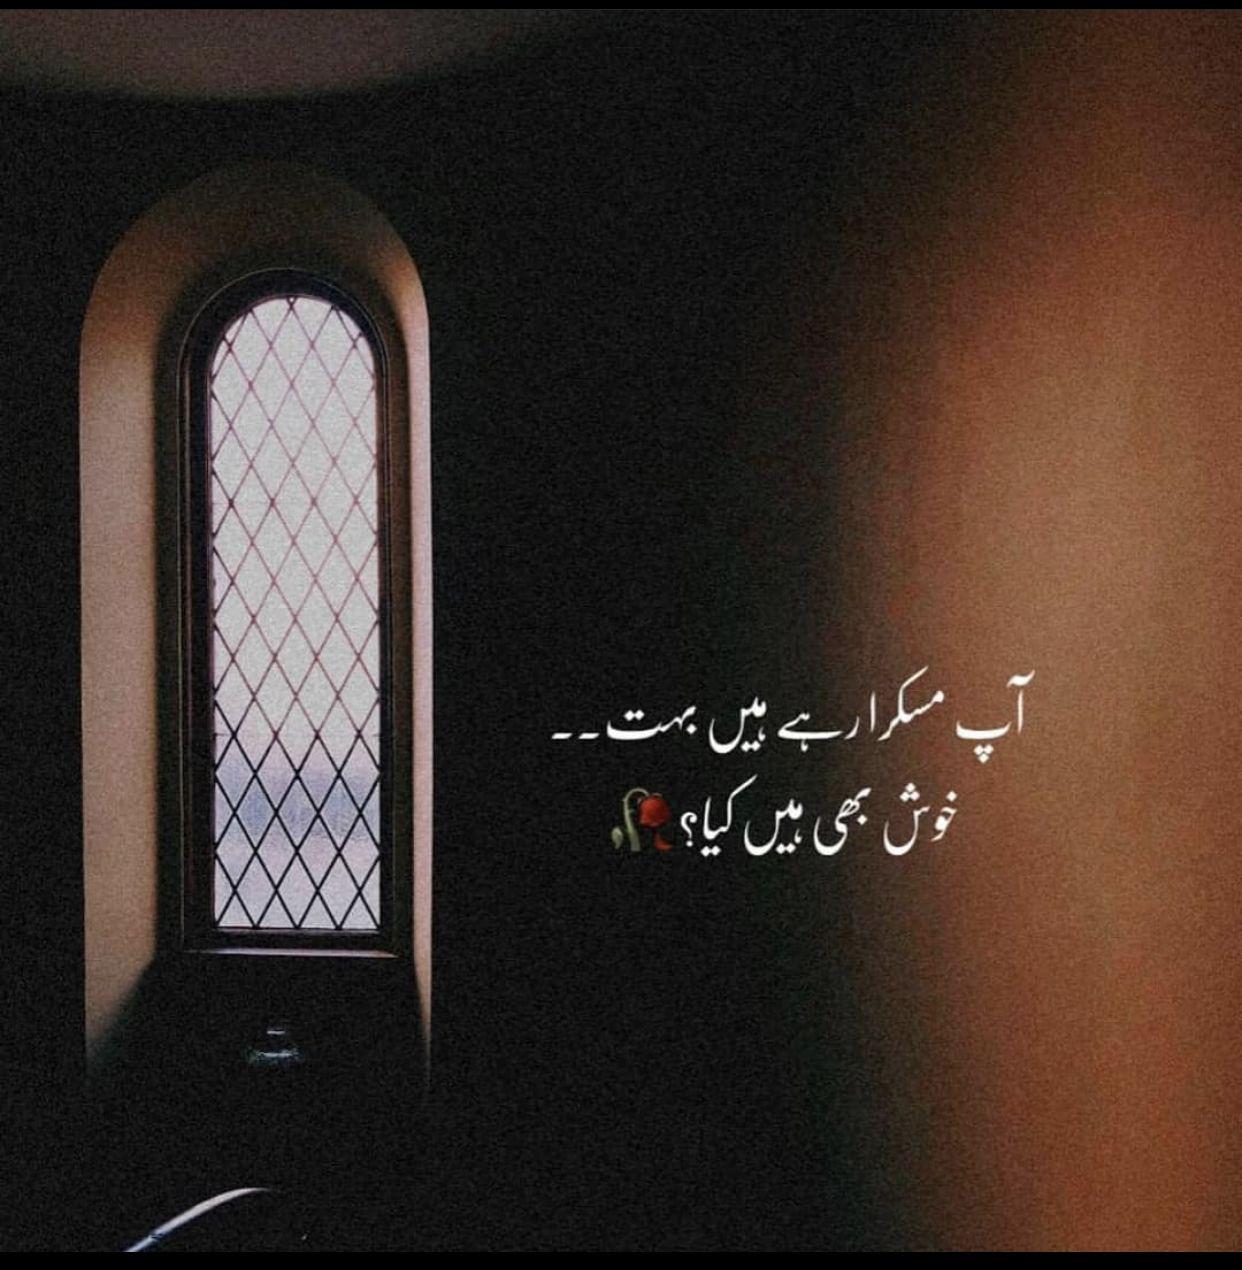 Pin By Munazamanxoor On Beautiful Urdu Poetry Heartfelt Quotes Poetry Words